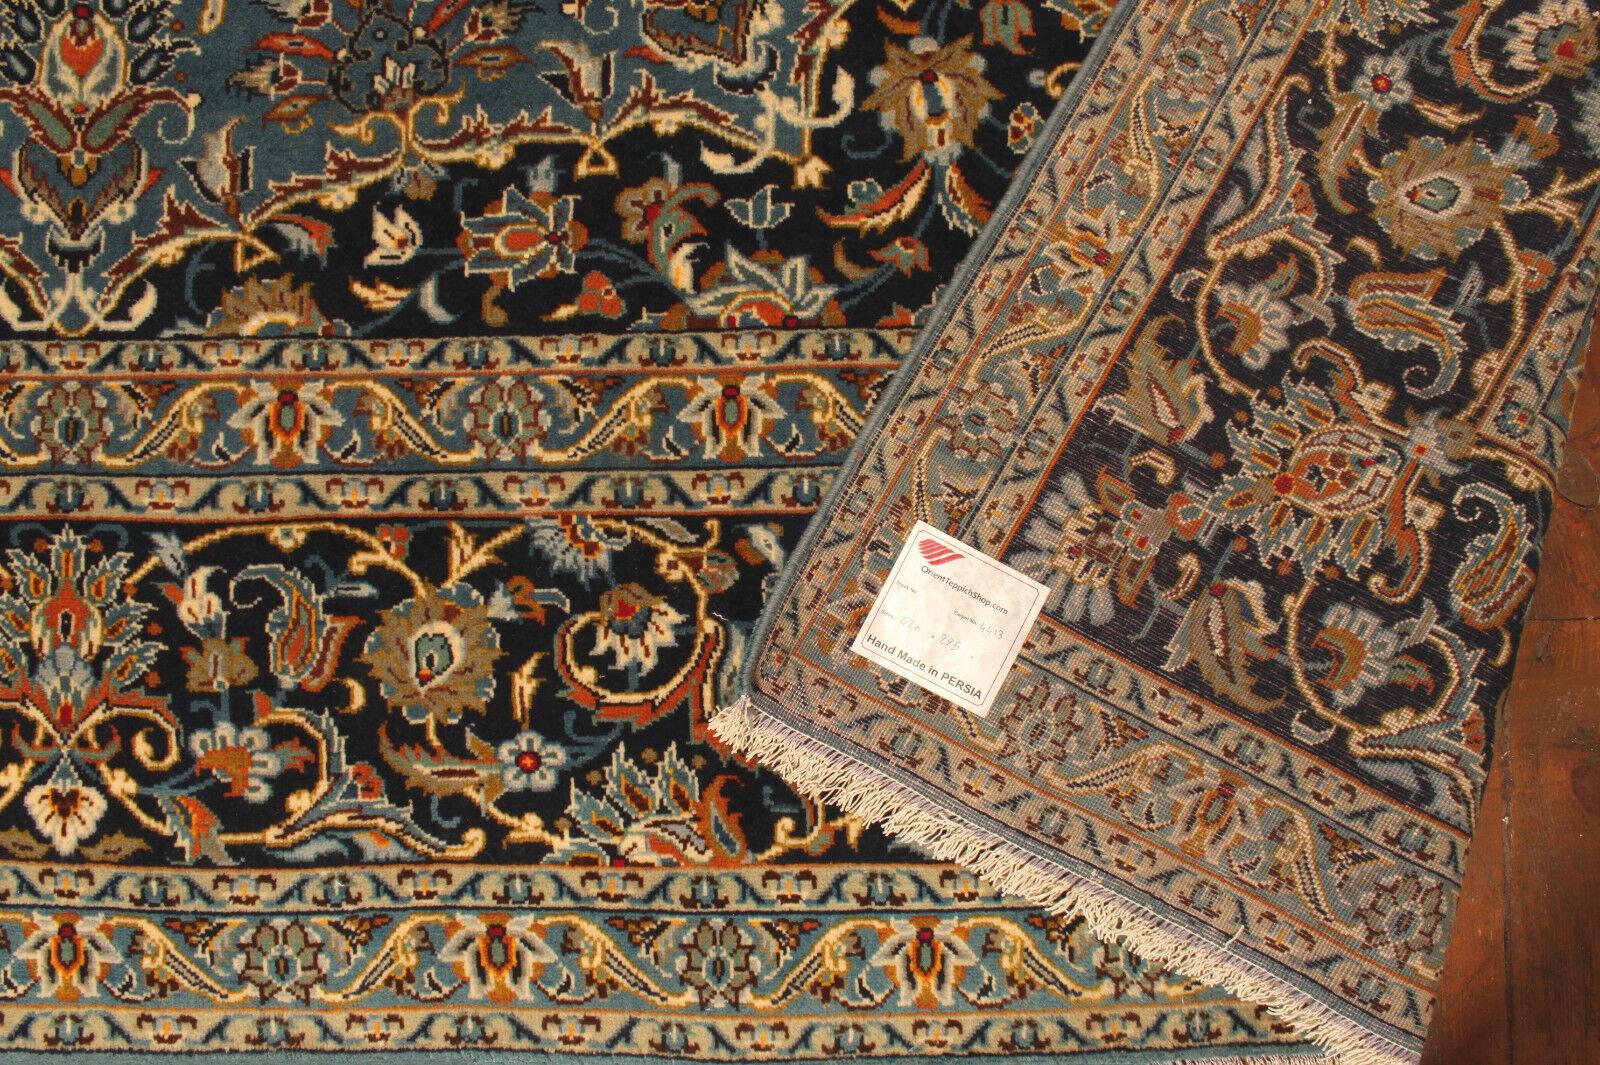 TAPPETO Orientale Vero Annodato Tapis Tapis Tapis persan n. 4413 (430 x 295) cm 2160ff